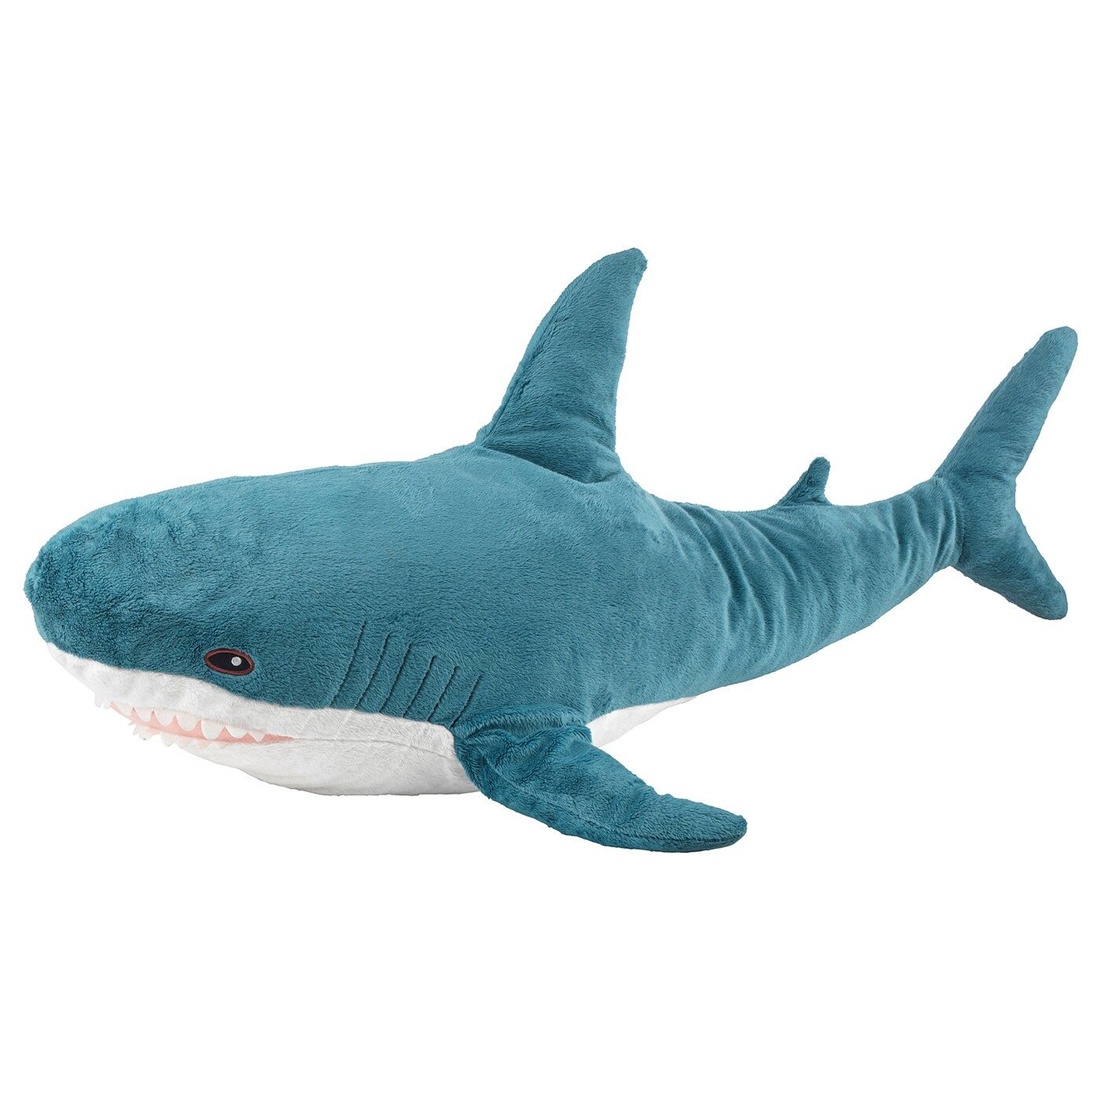 Мягкая игрушка, акула, 100 см БЛОХЭЙ [403.735.97] 403.735.97